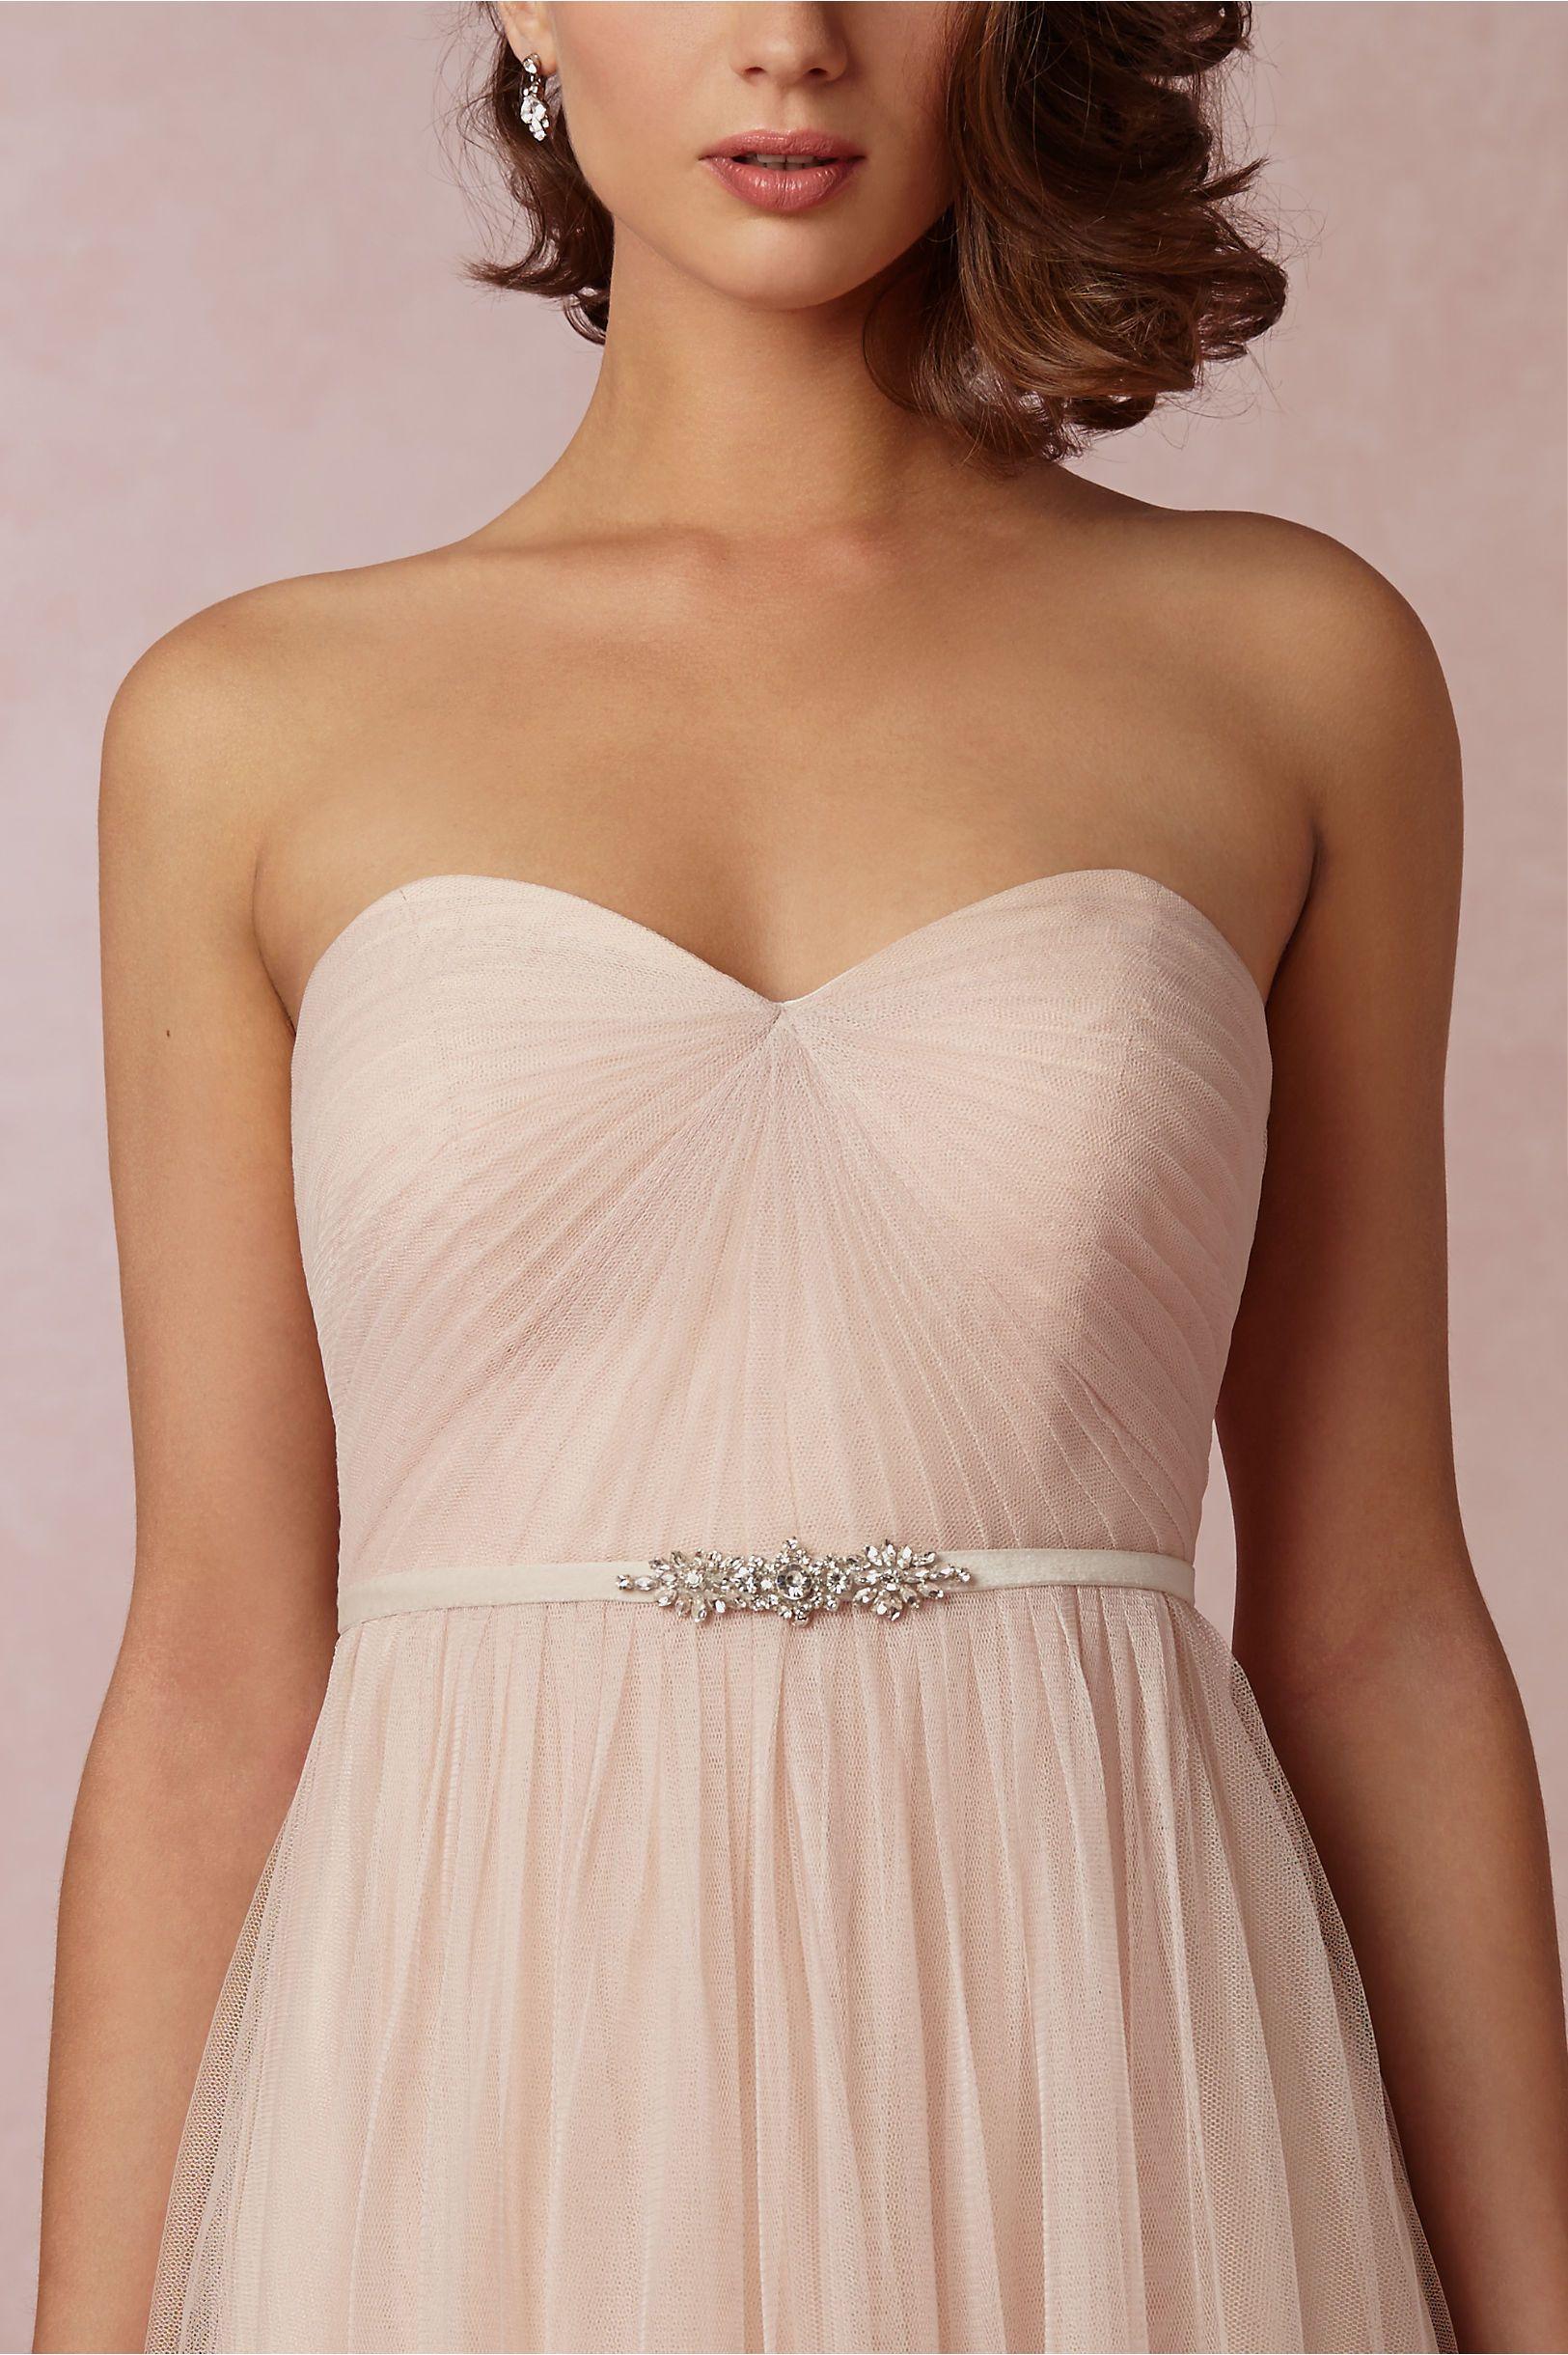 Mischka Bridesmaids Belt by Jenny Yoo | BHLDN